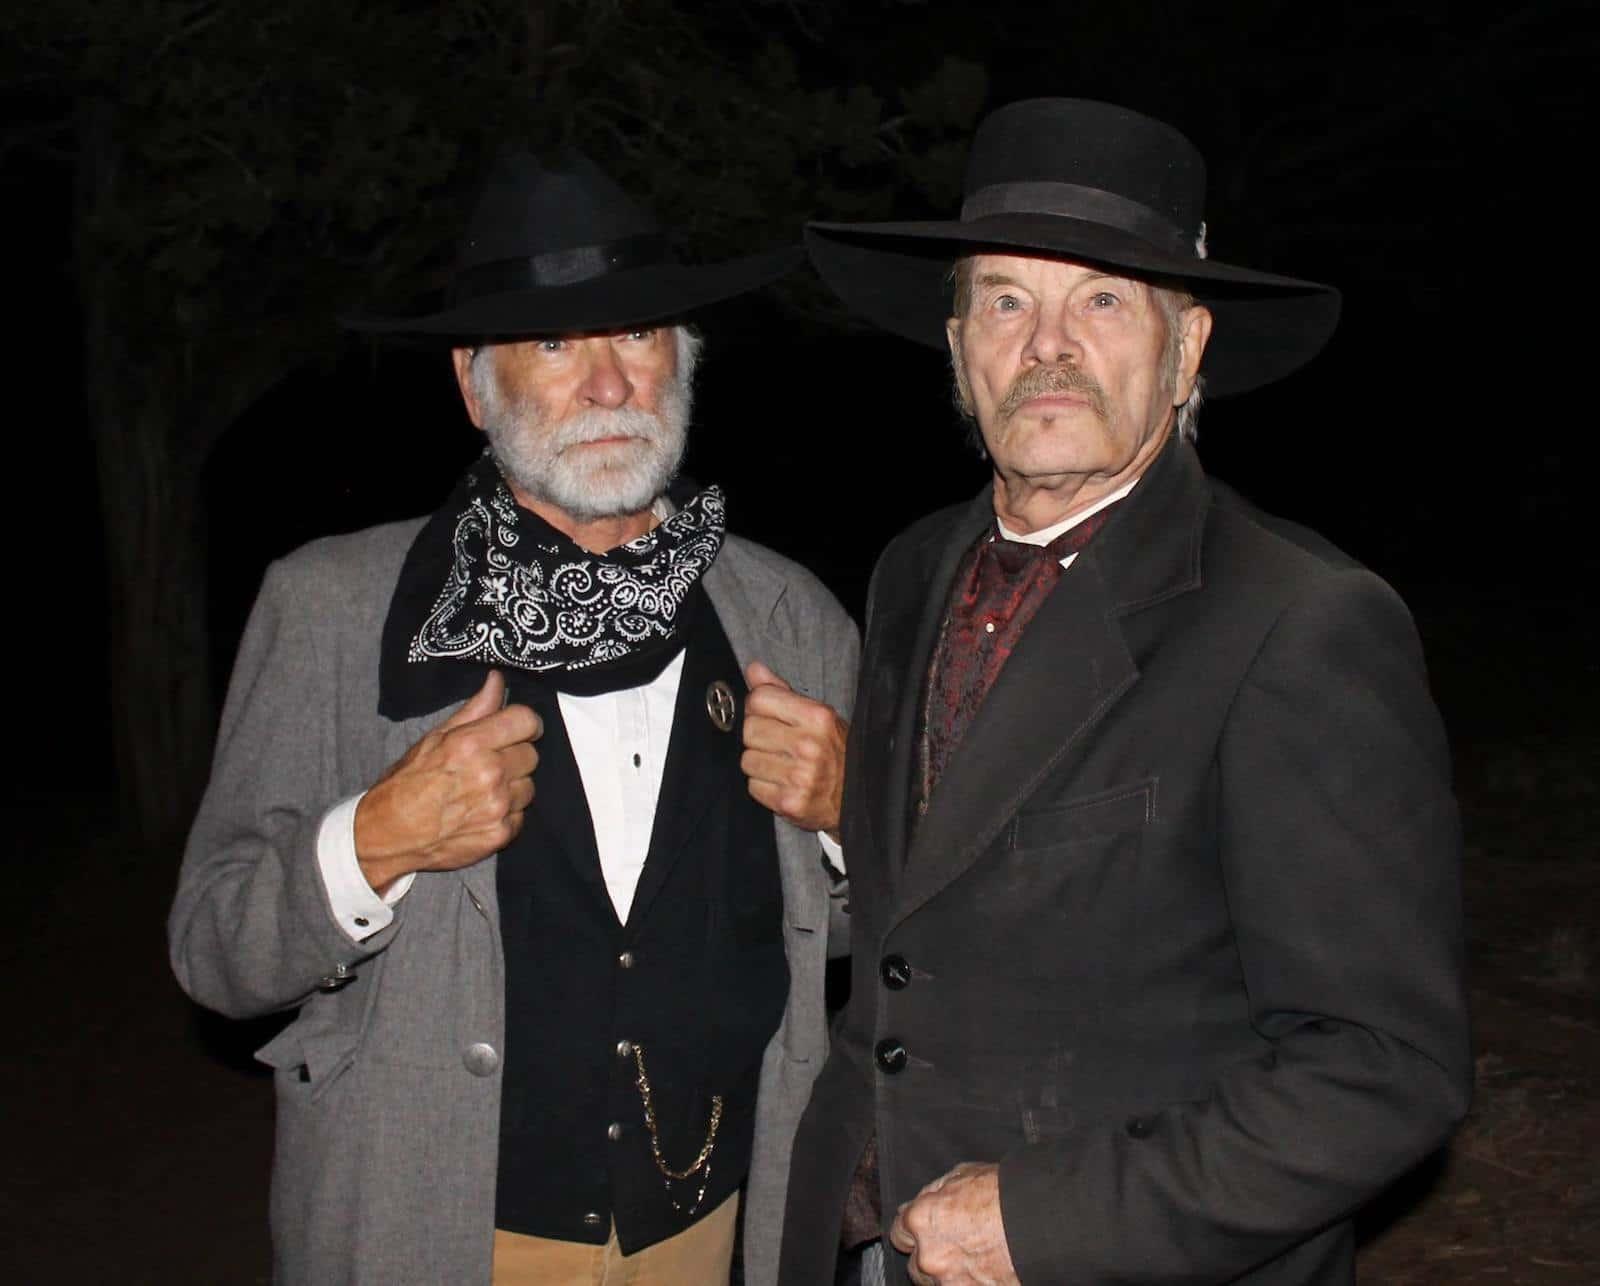 Image of actors at the Ghost Walk in Glenwood Springs